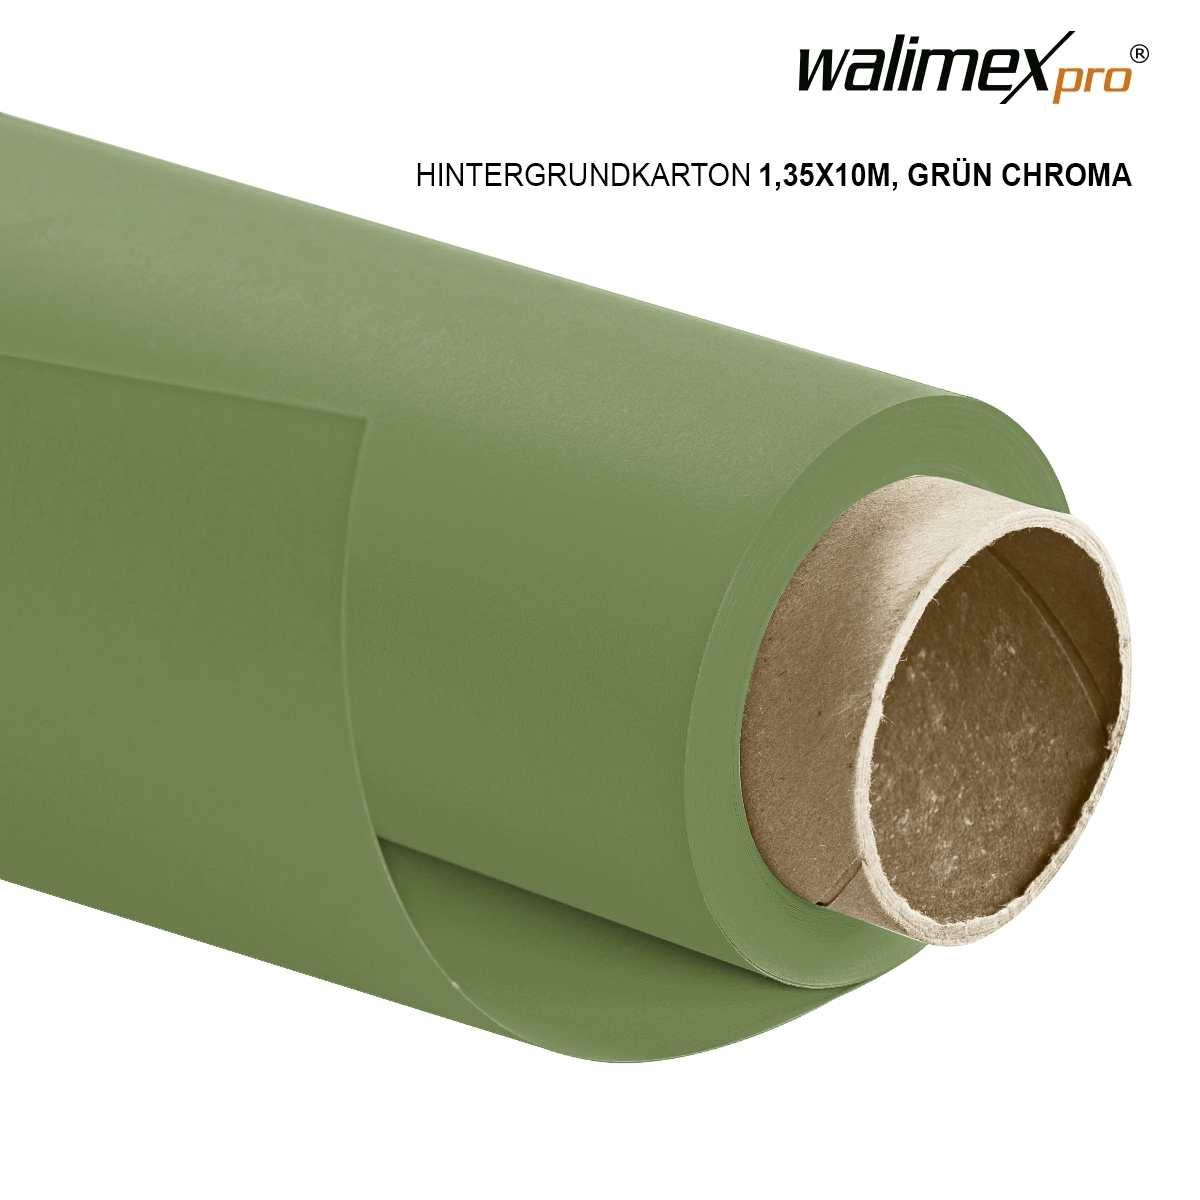 Walimex pro paper background 1,35x10m,green chroma